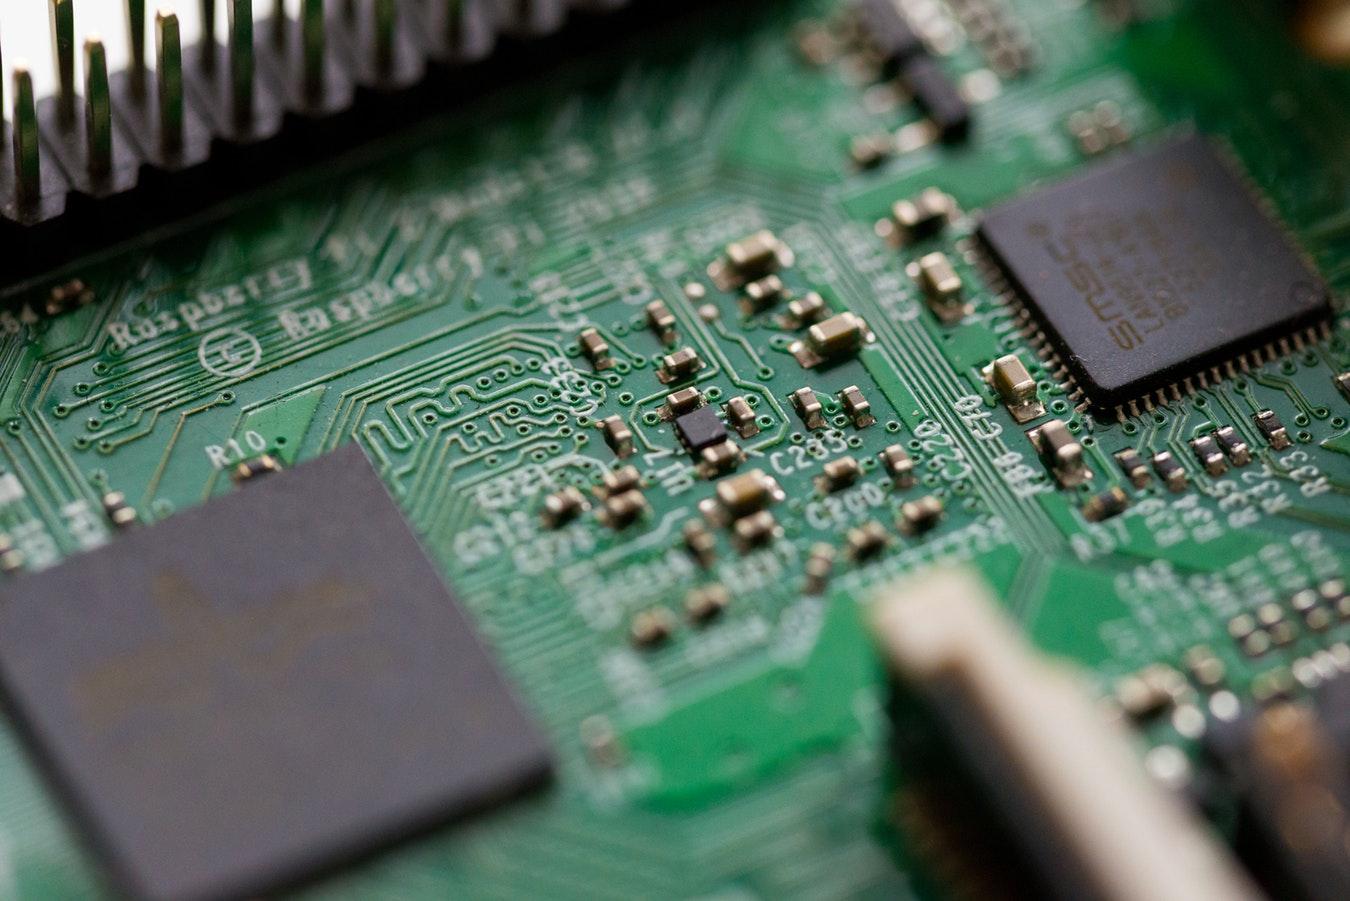 Method Of Troubleshooting Electronic Circuit Board Assemblies